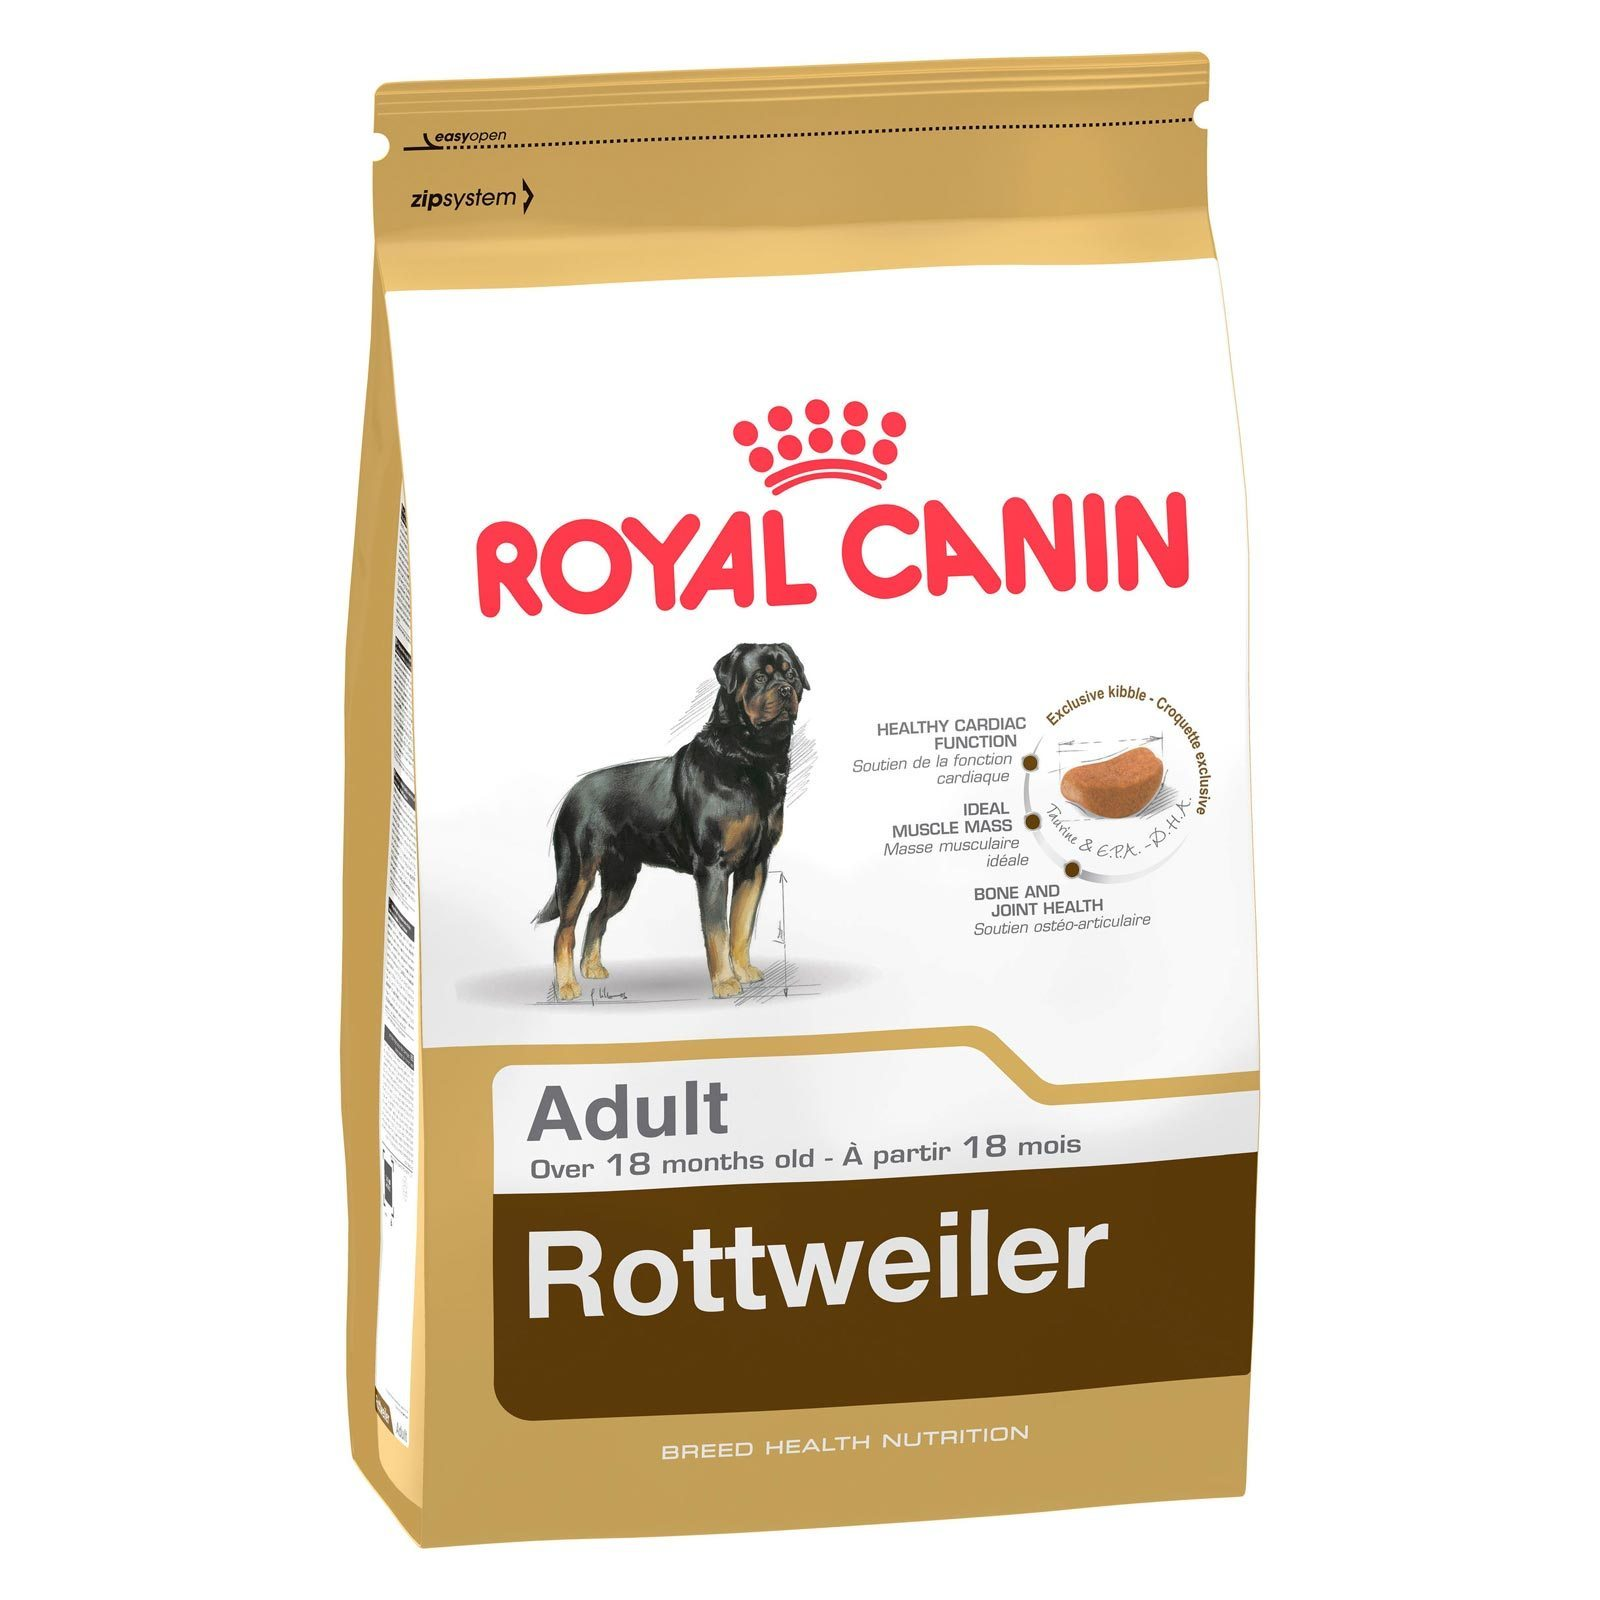 Royal Canin Rottweiler Adult - Pet Food - Pet Store - Pet supplies